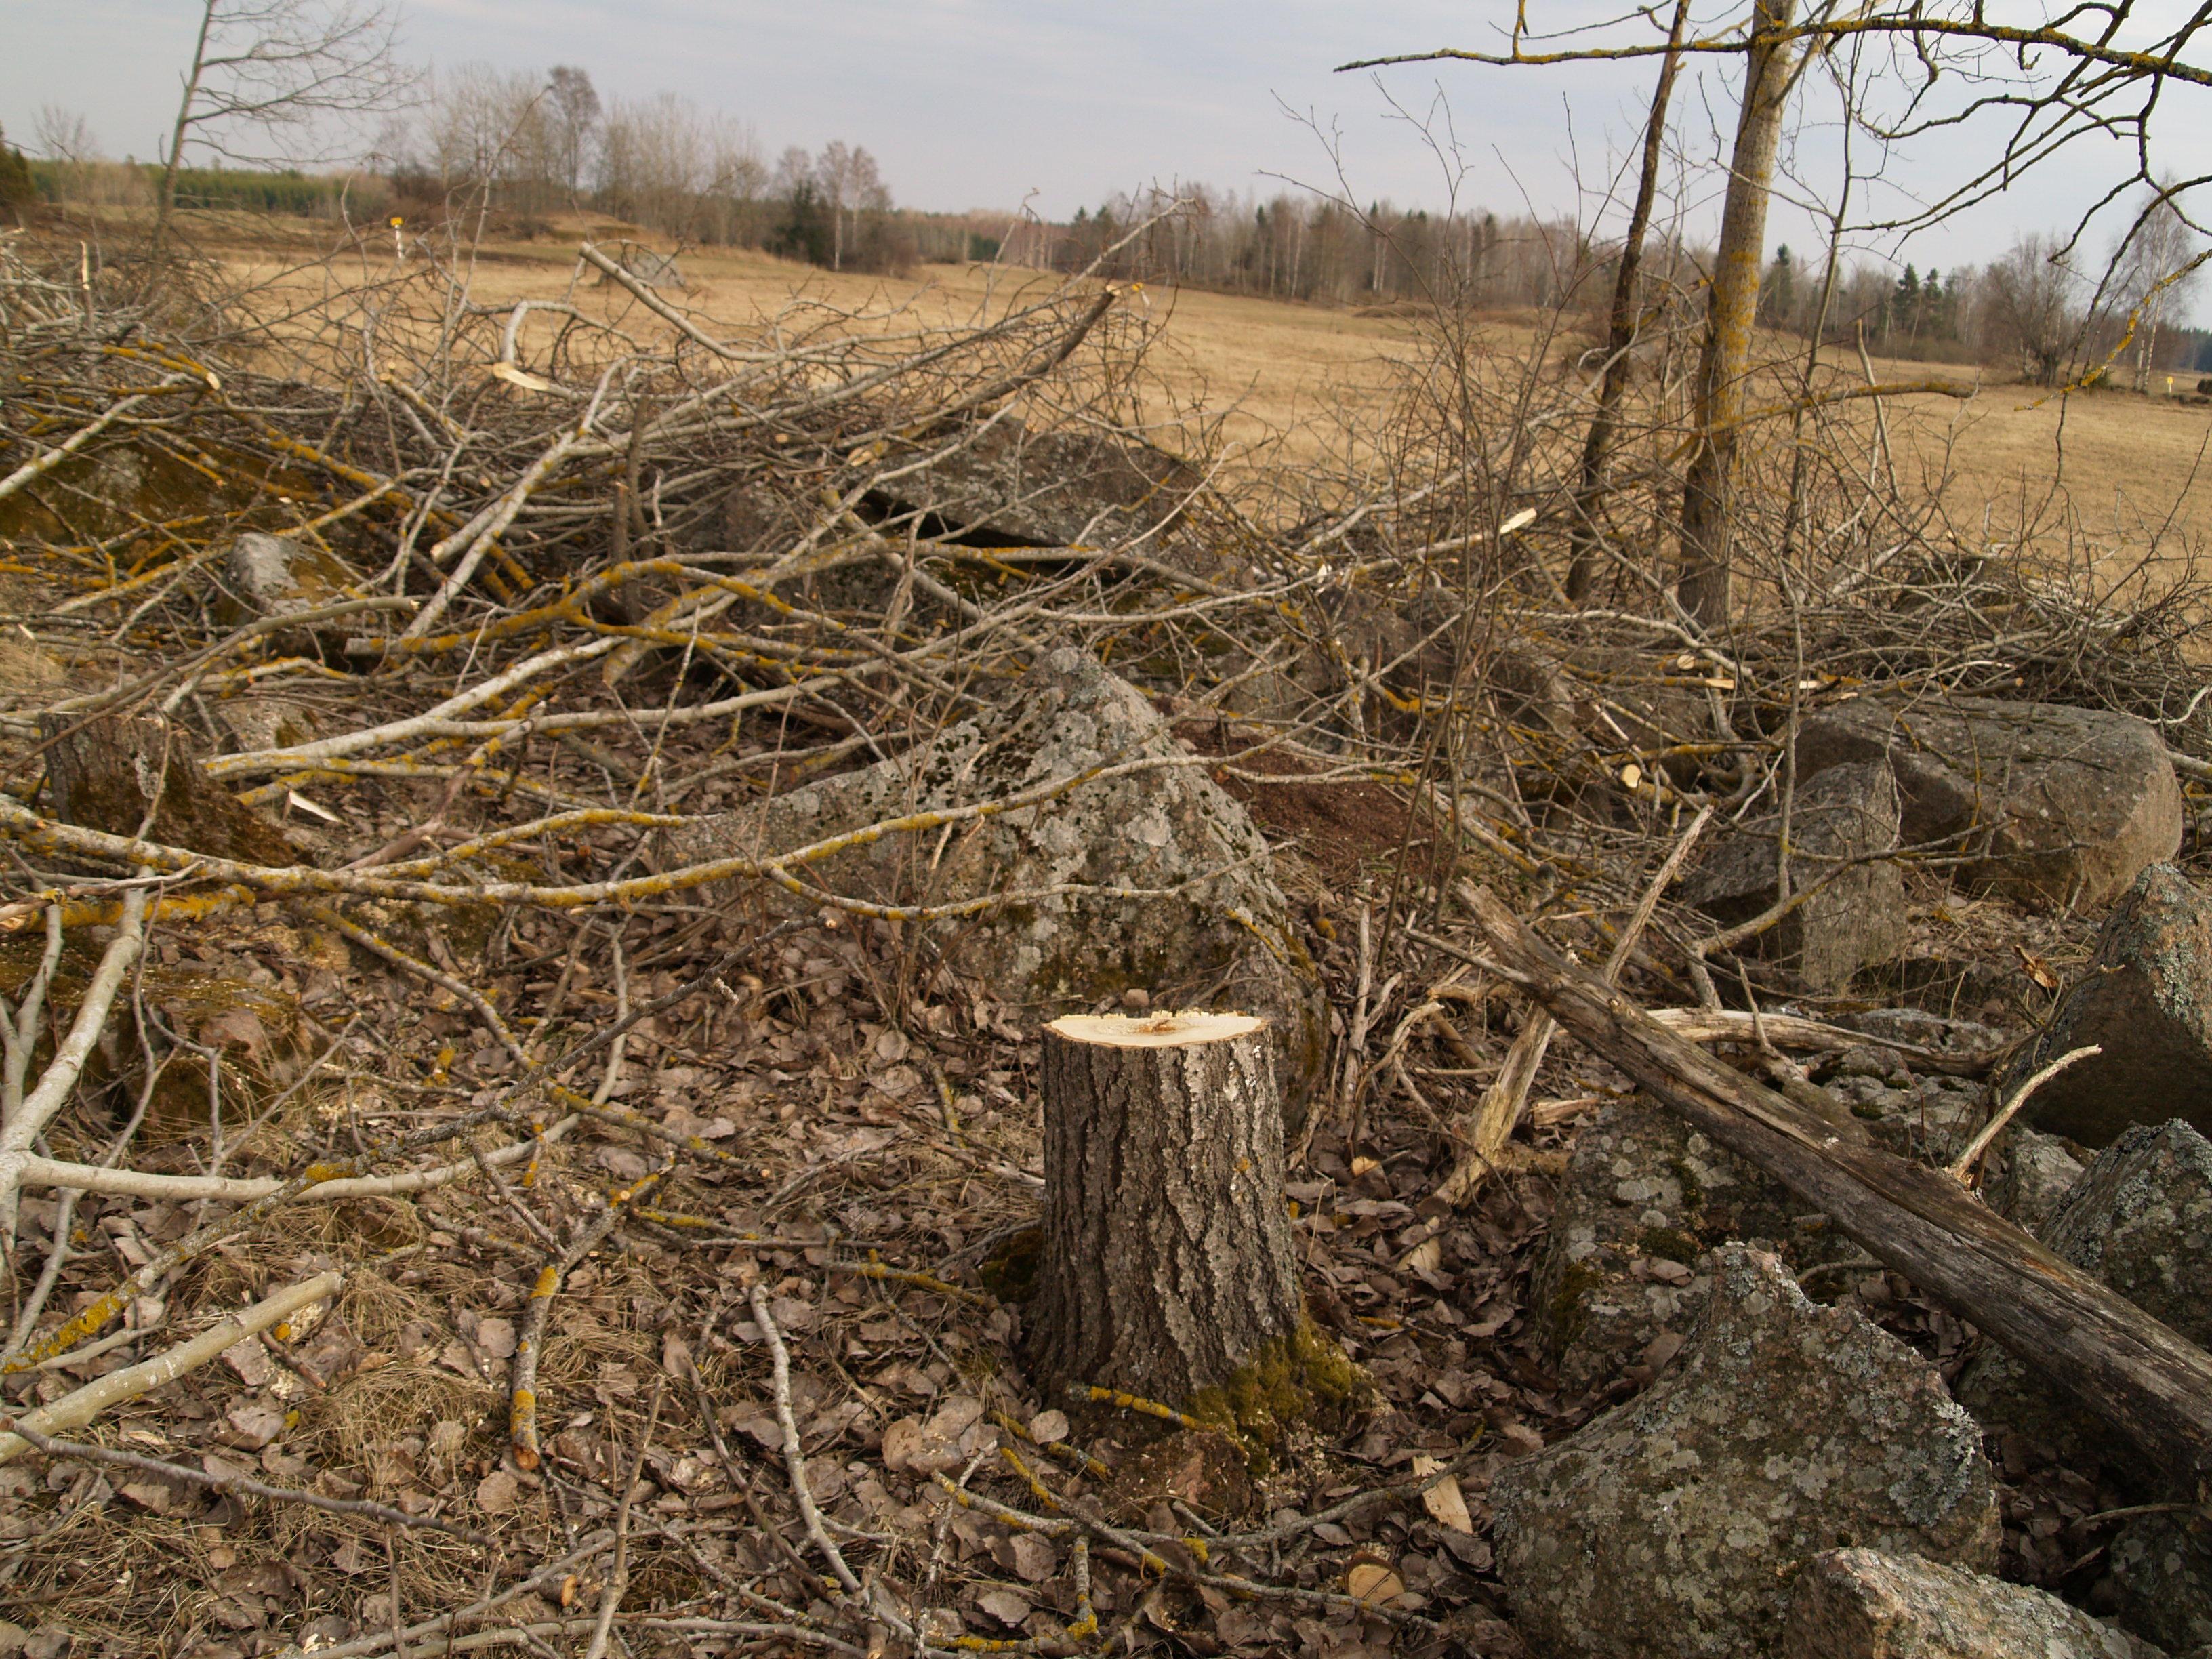 treestump 1 by akinna-stock